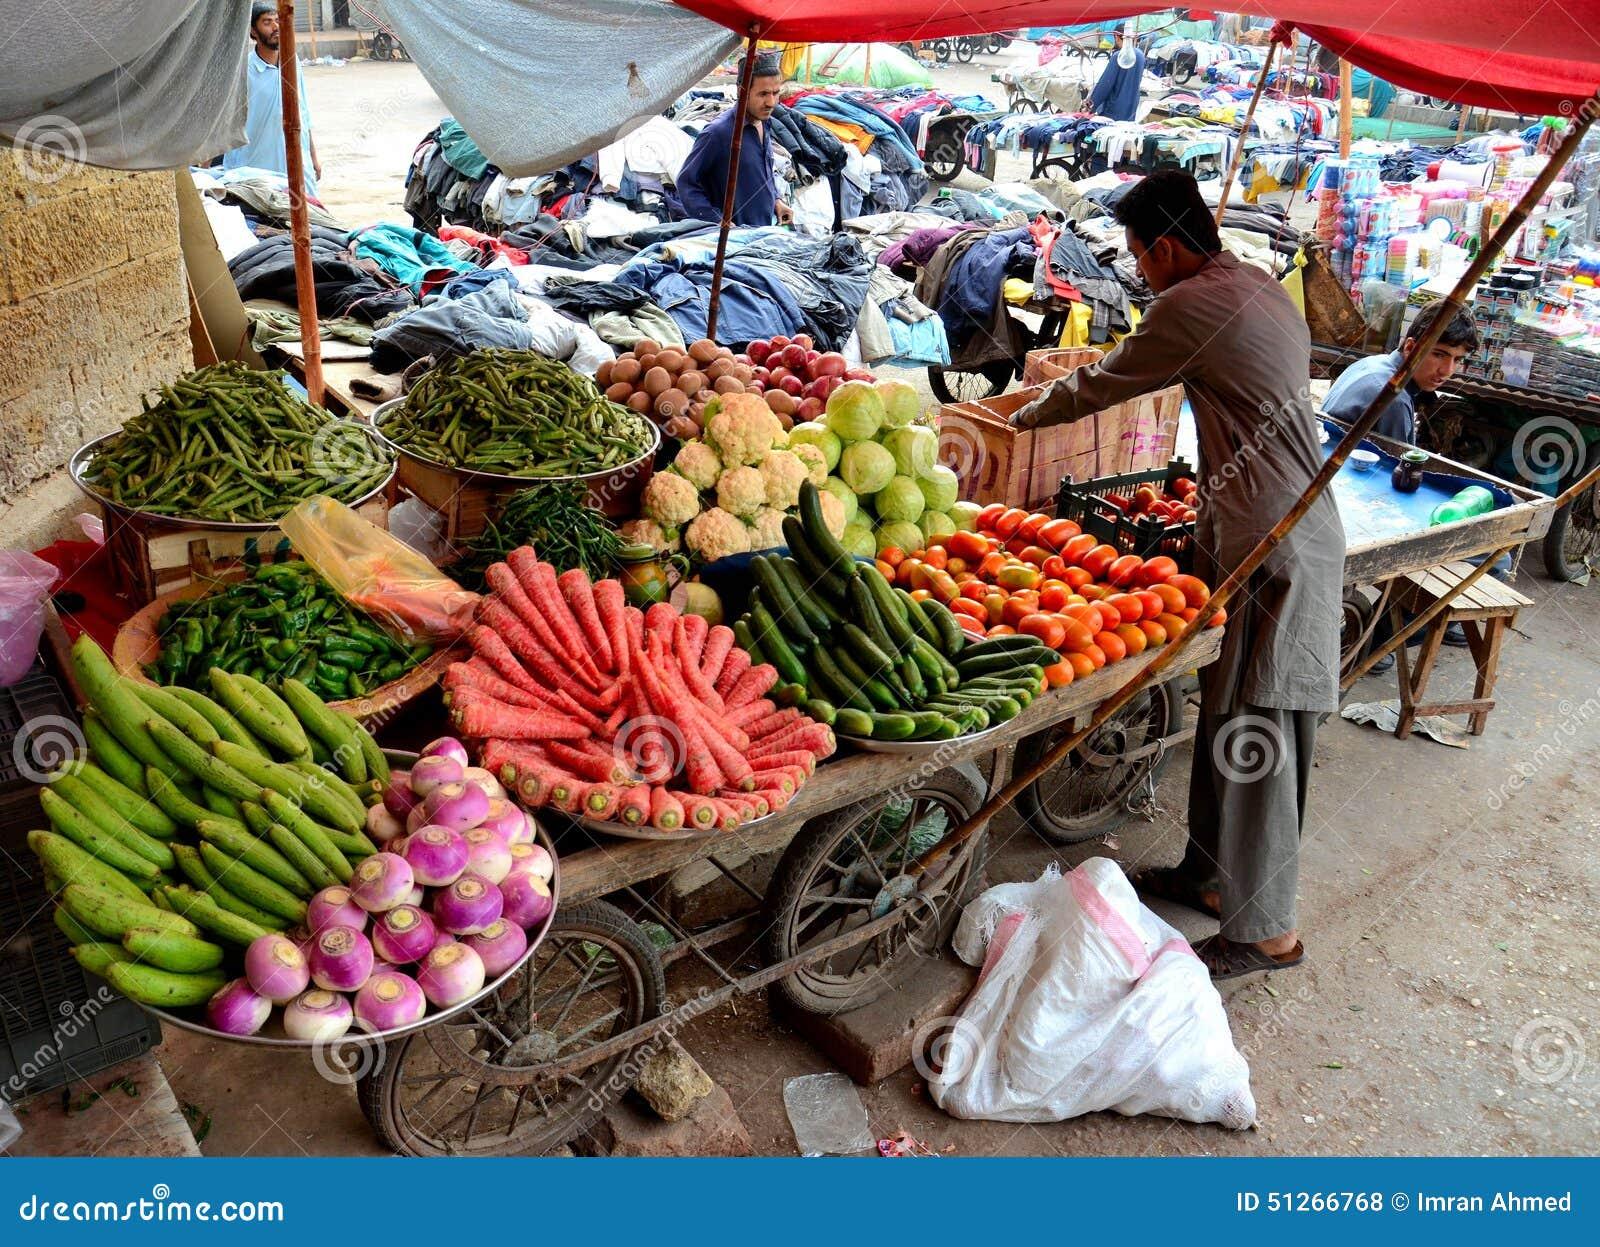 Street vendor in pakistan - Carro de frutas ...